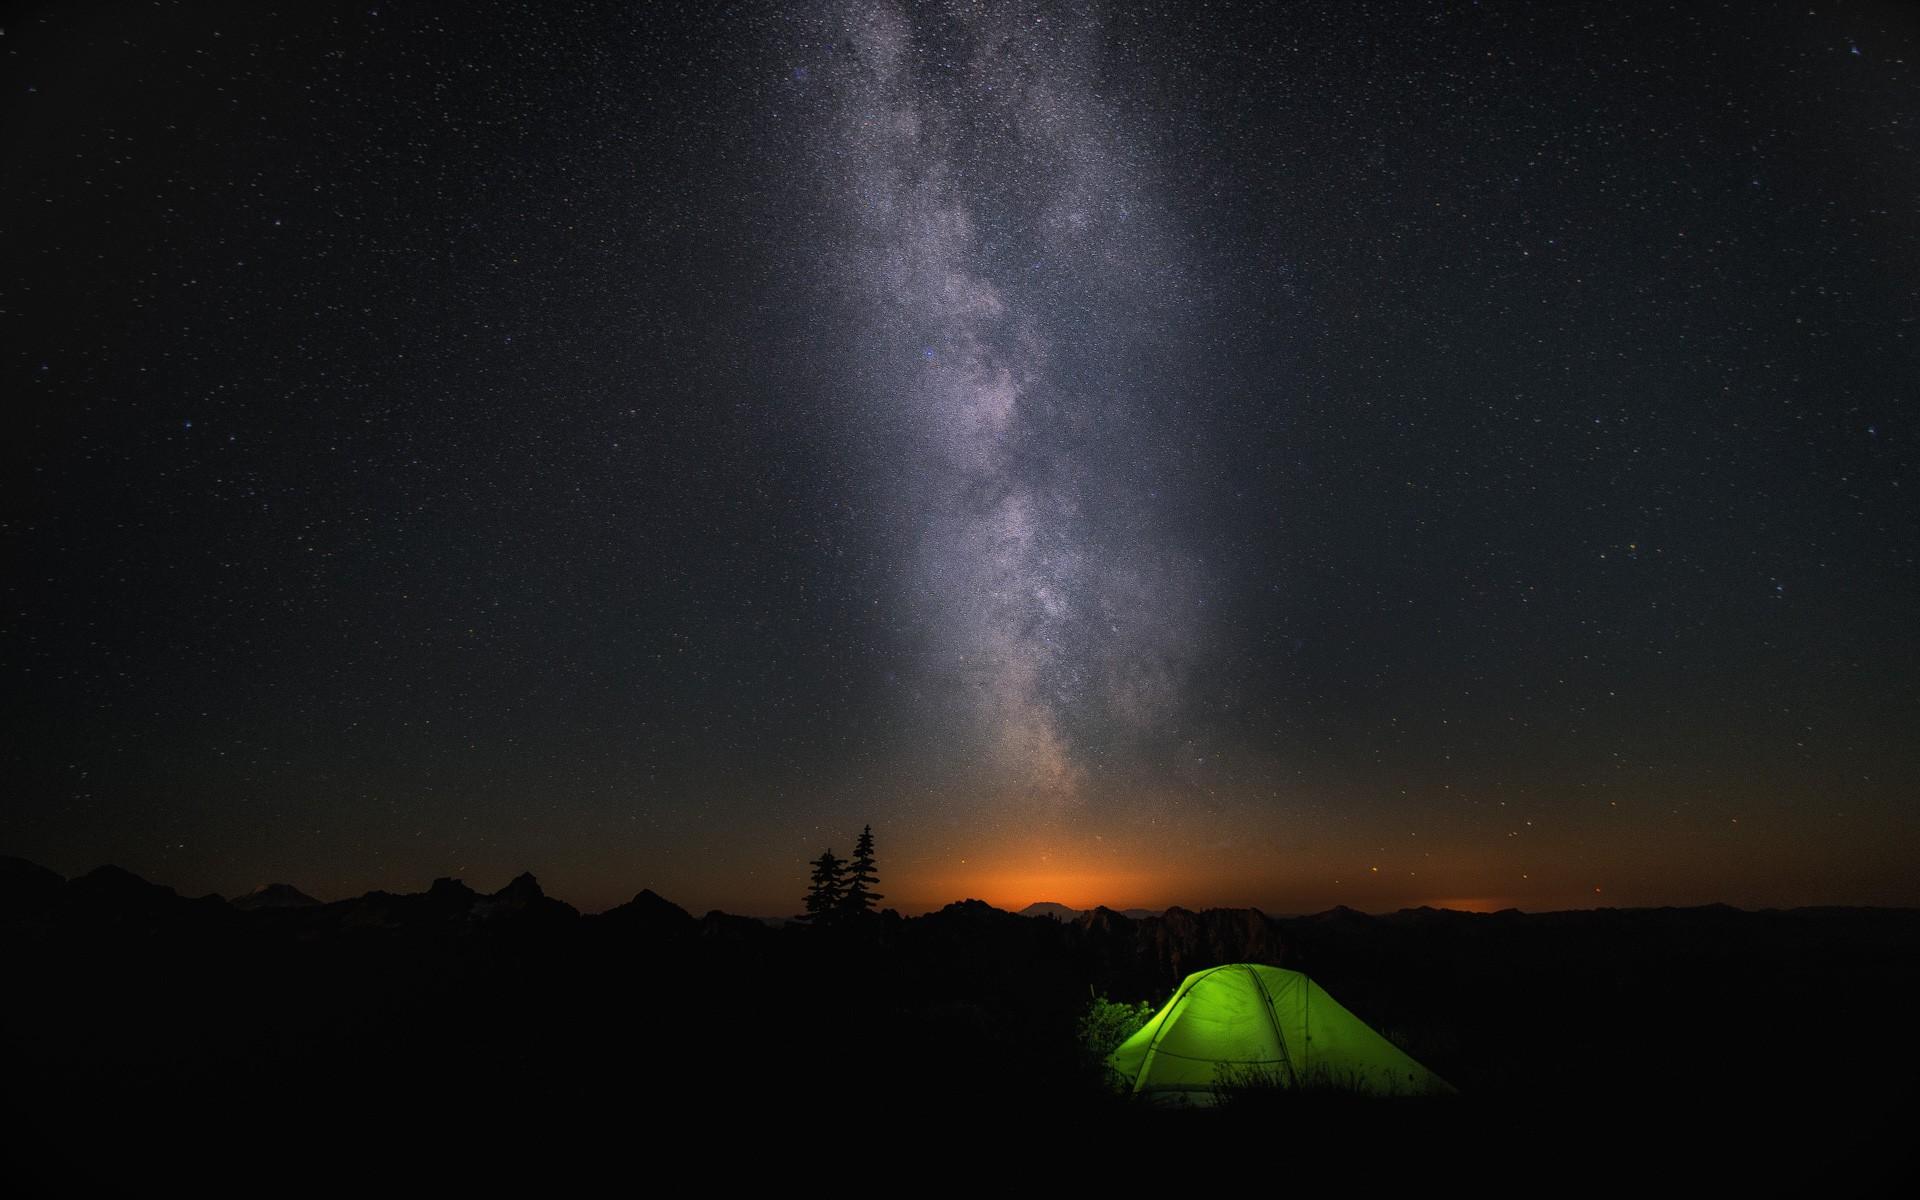 Sfondi Notte Galassia Cielo Atmosfera Tenda Microsoft Windows